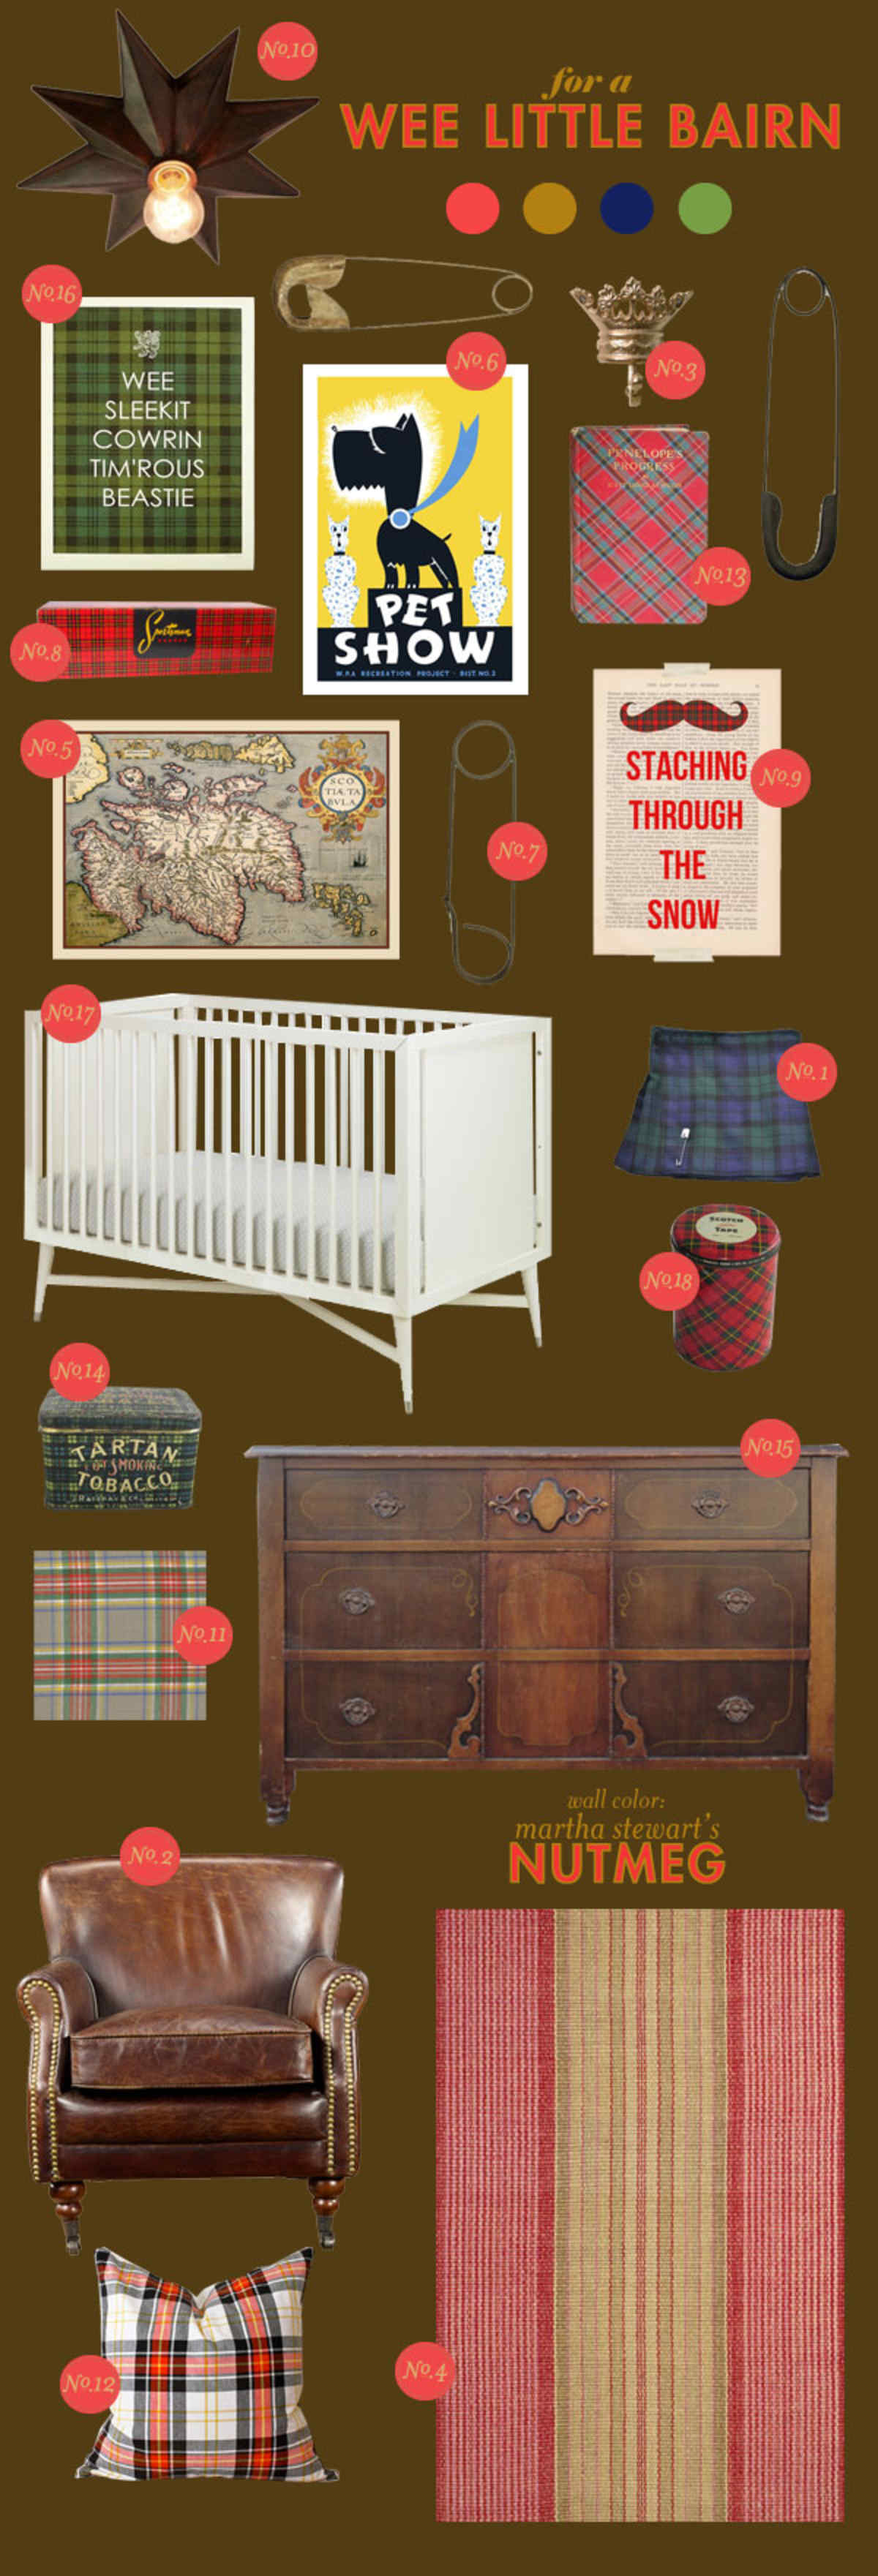 tartan scottish plaid baby room ideas